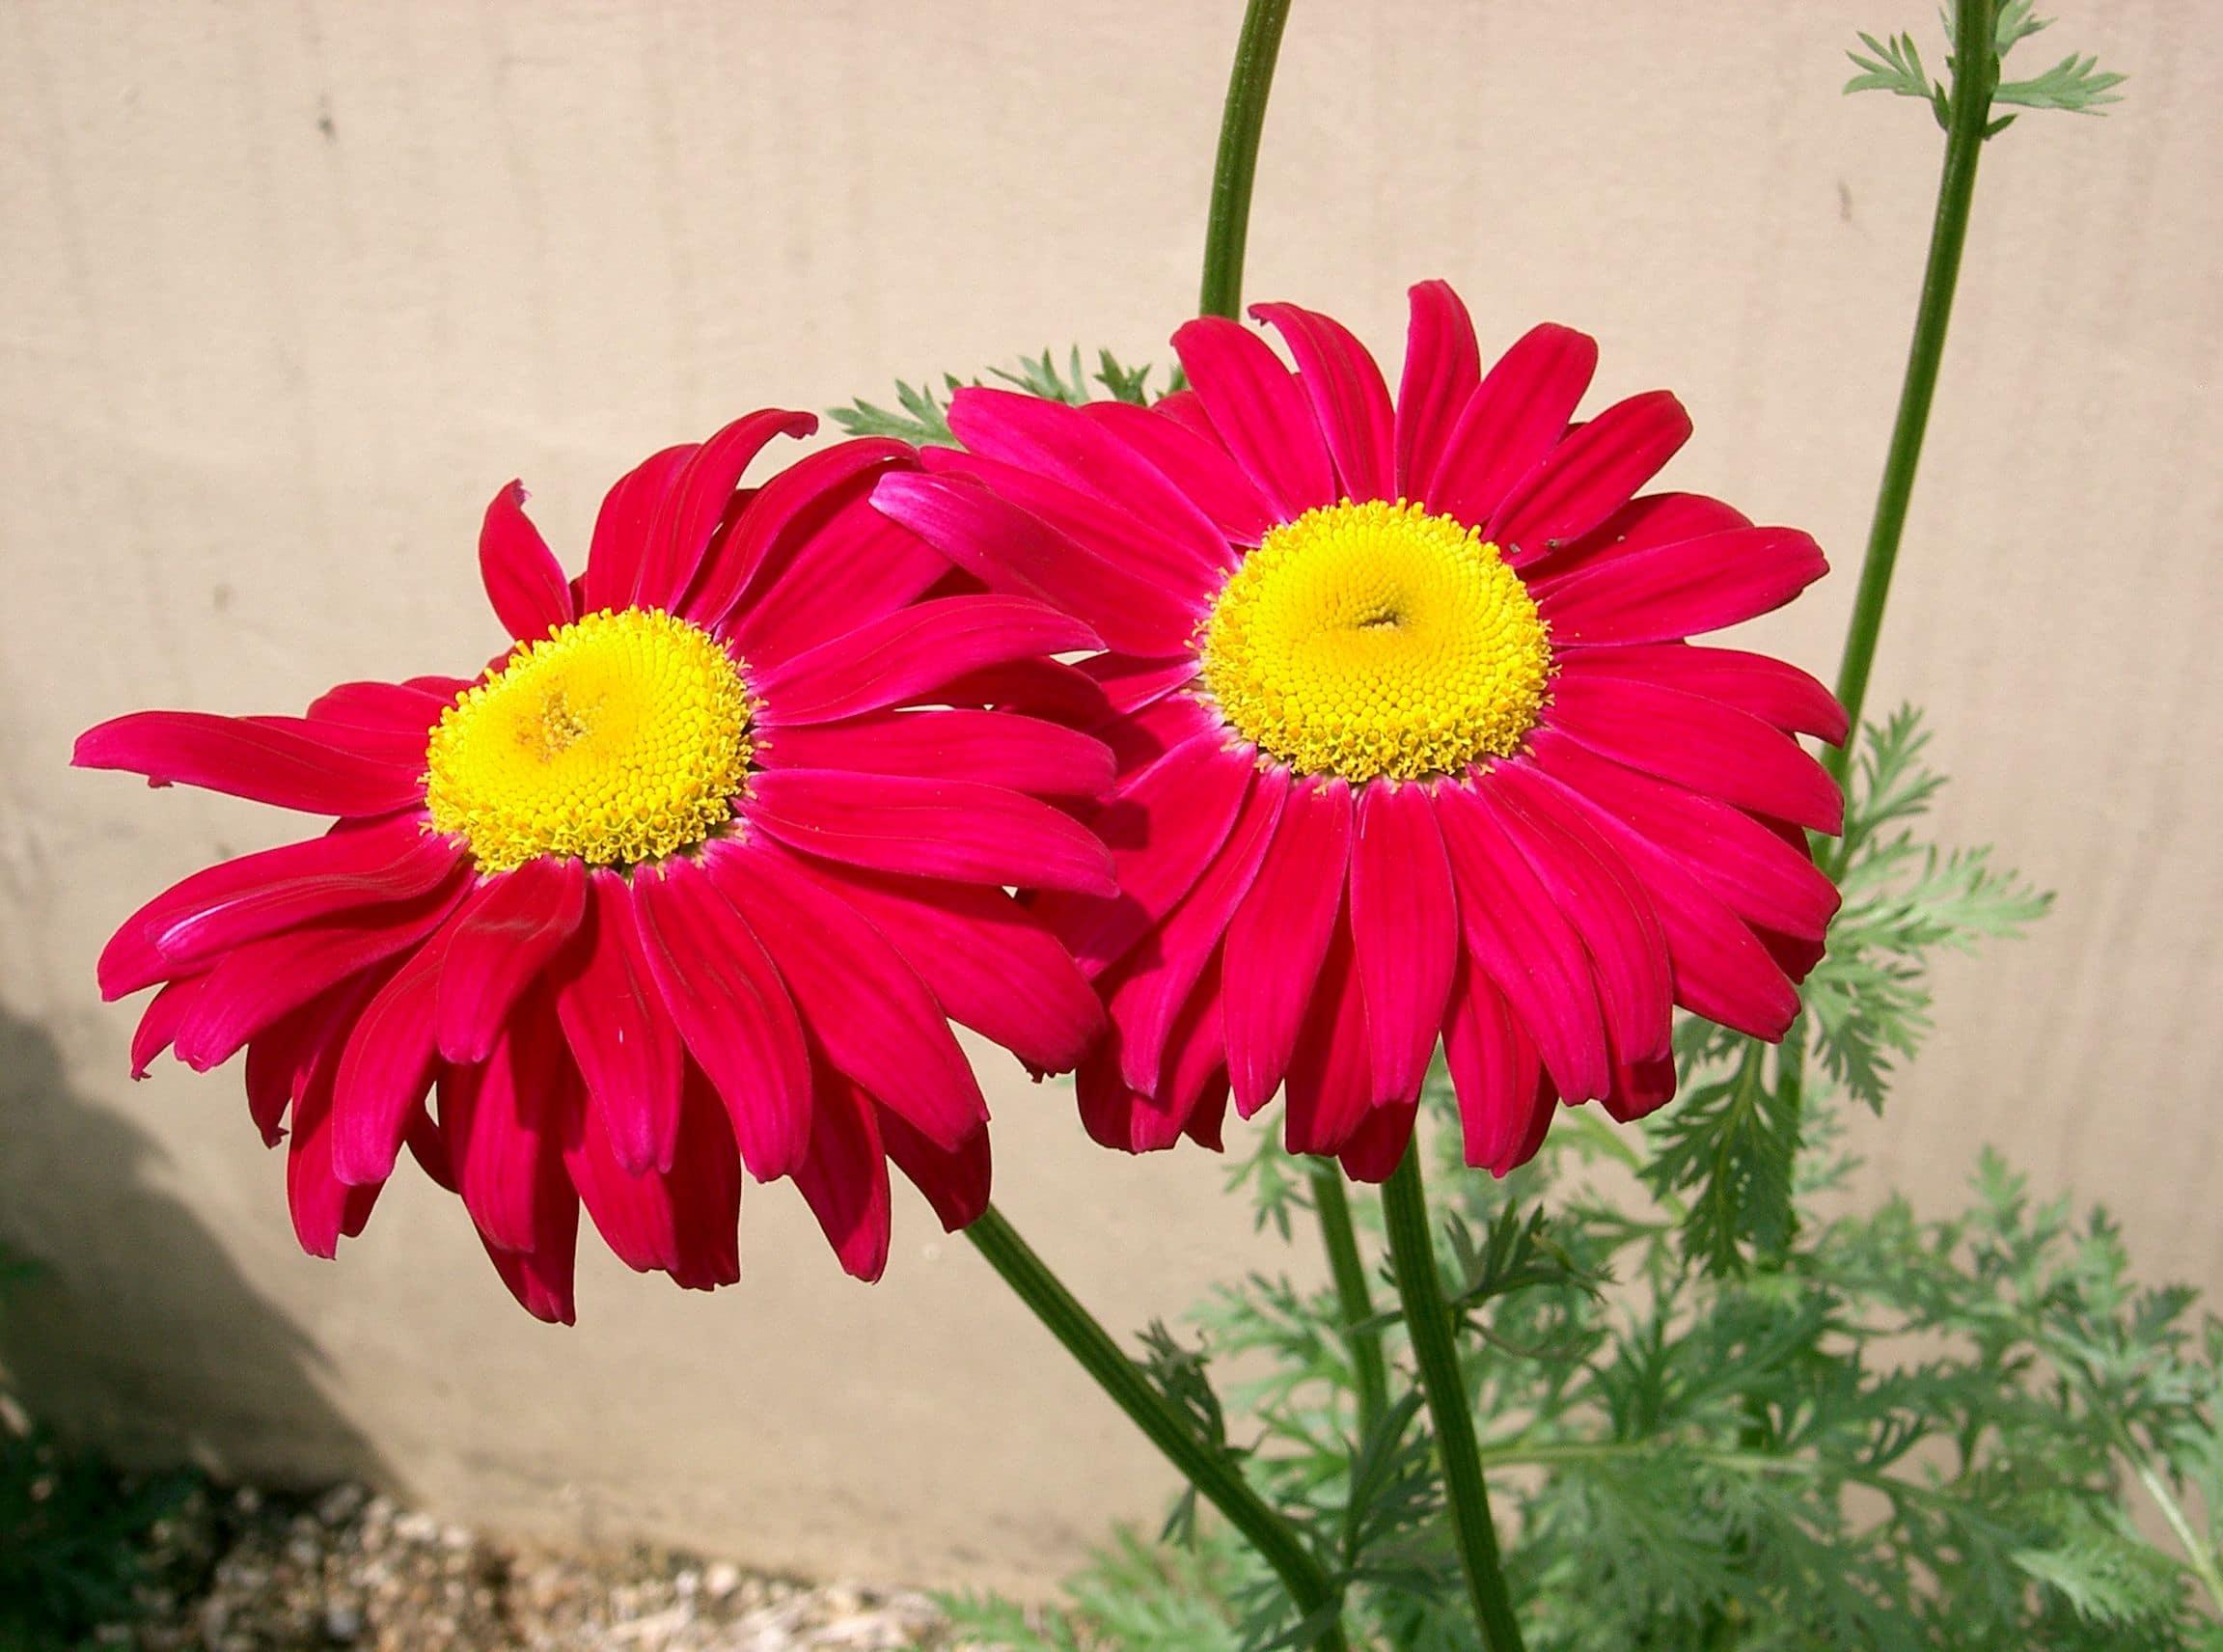 Painted Daisy. (Tanacetum coccineum).